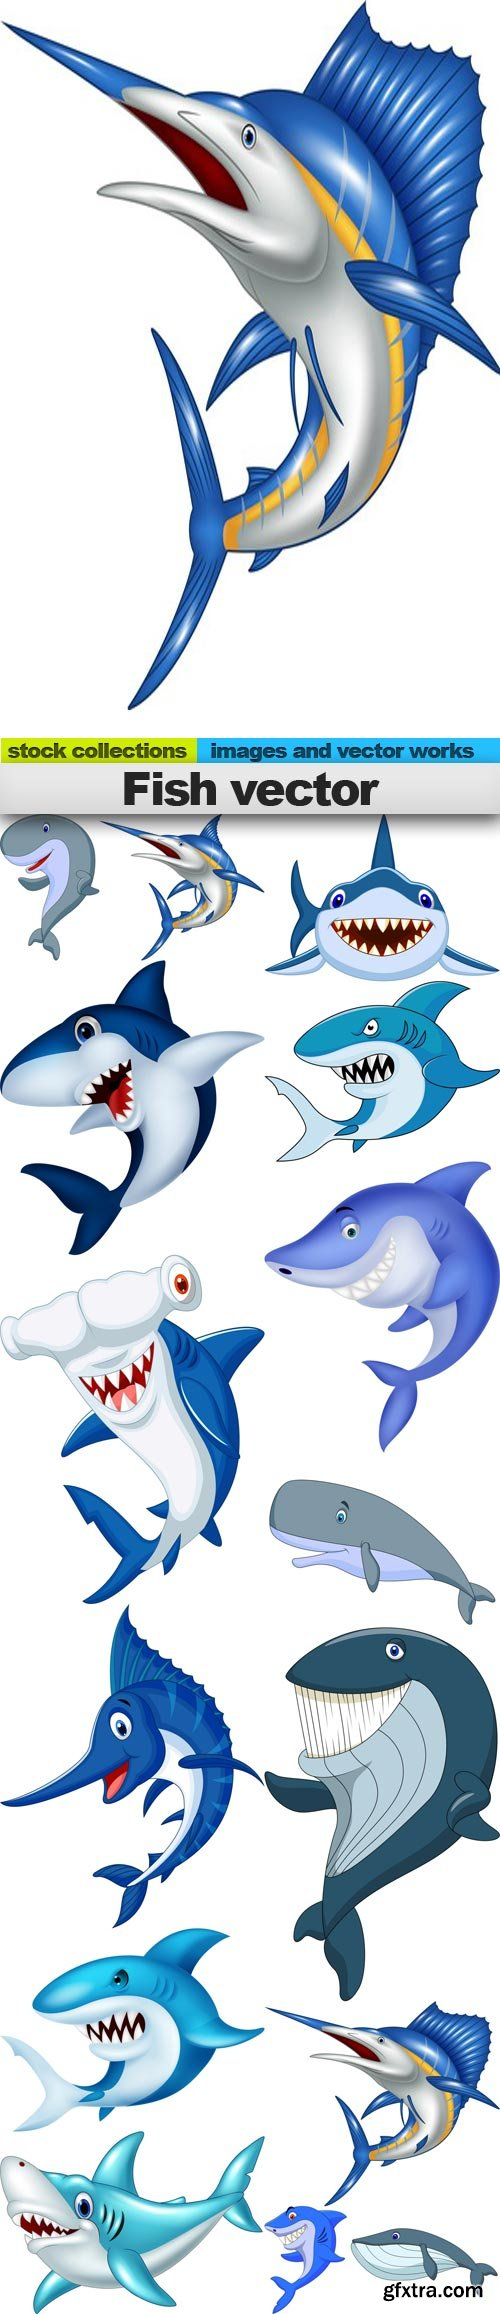 Fish vector, 15 x EPS